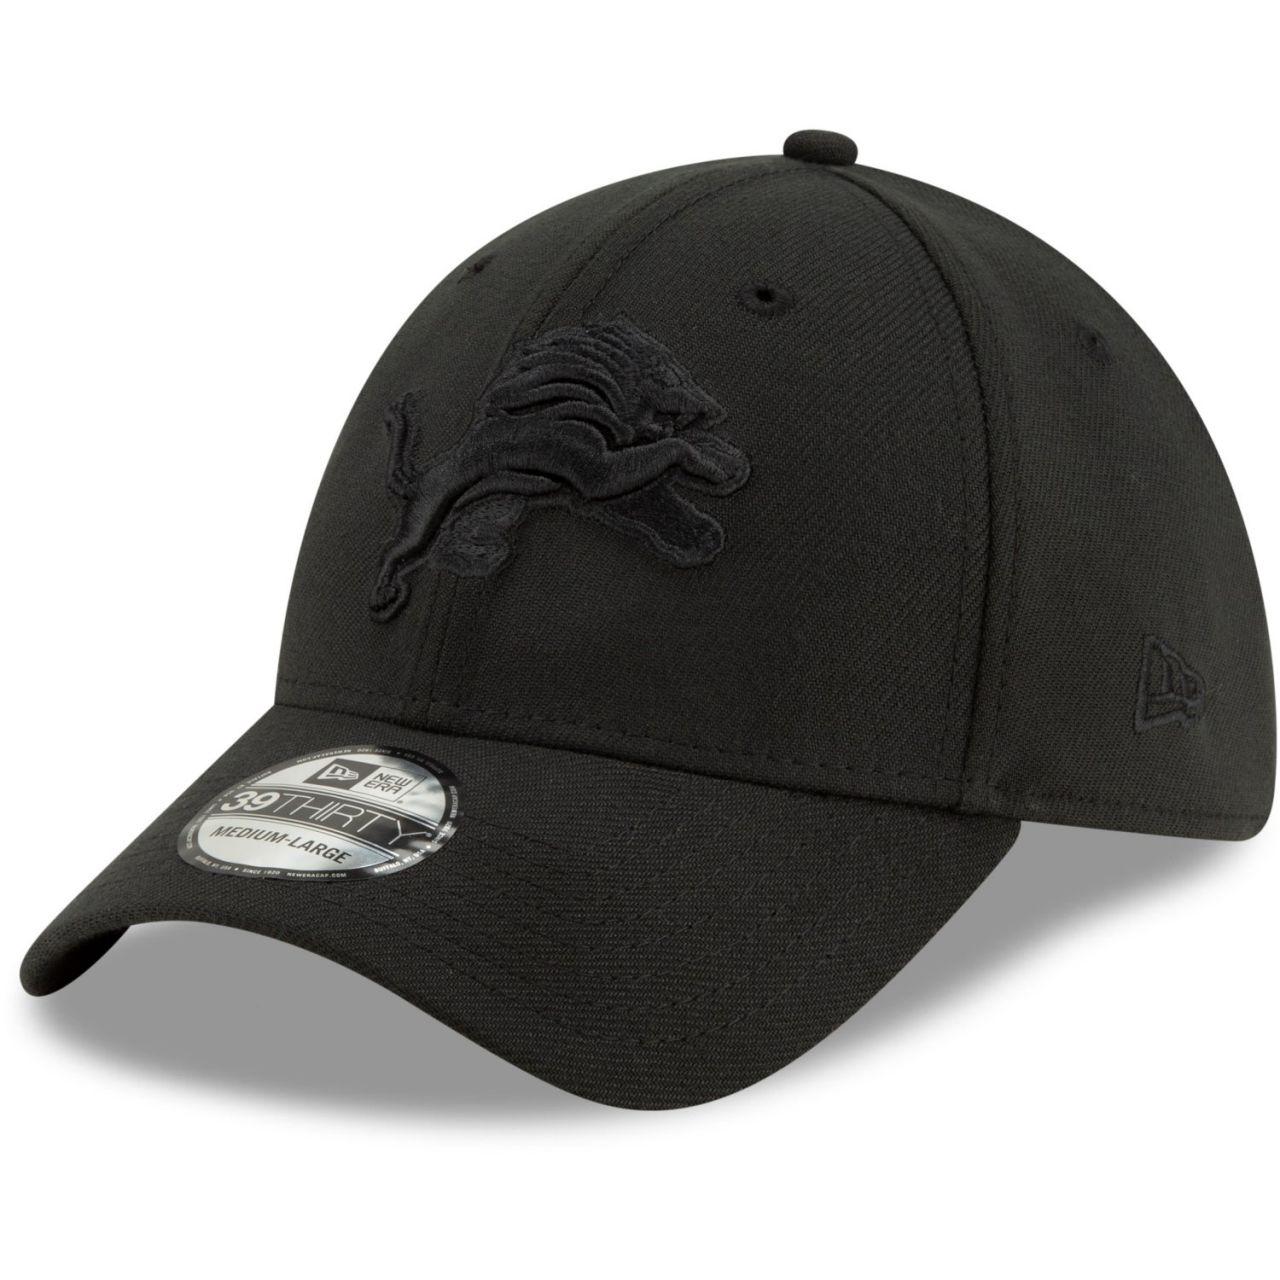 amfoo - New Era 39Thirty Stretch Cap - NFL Detroit Lions